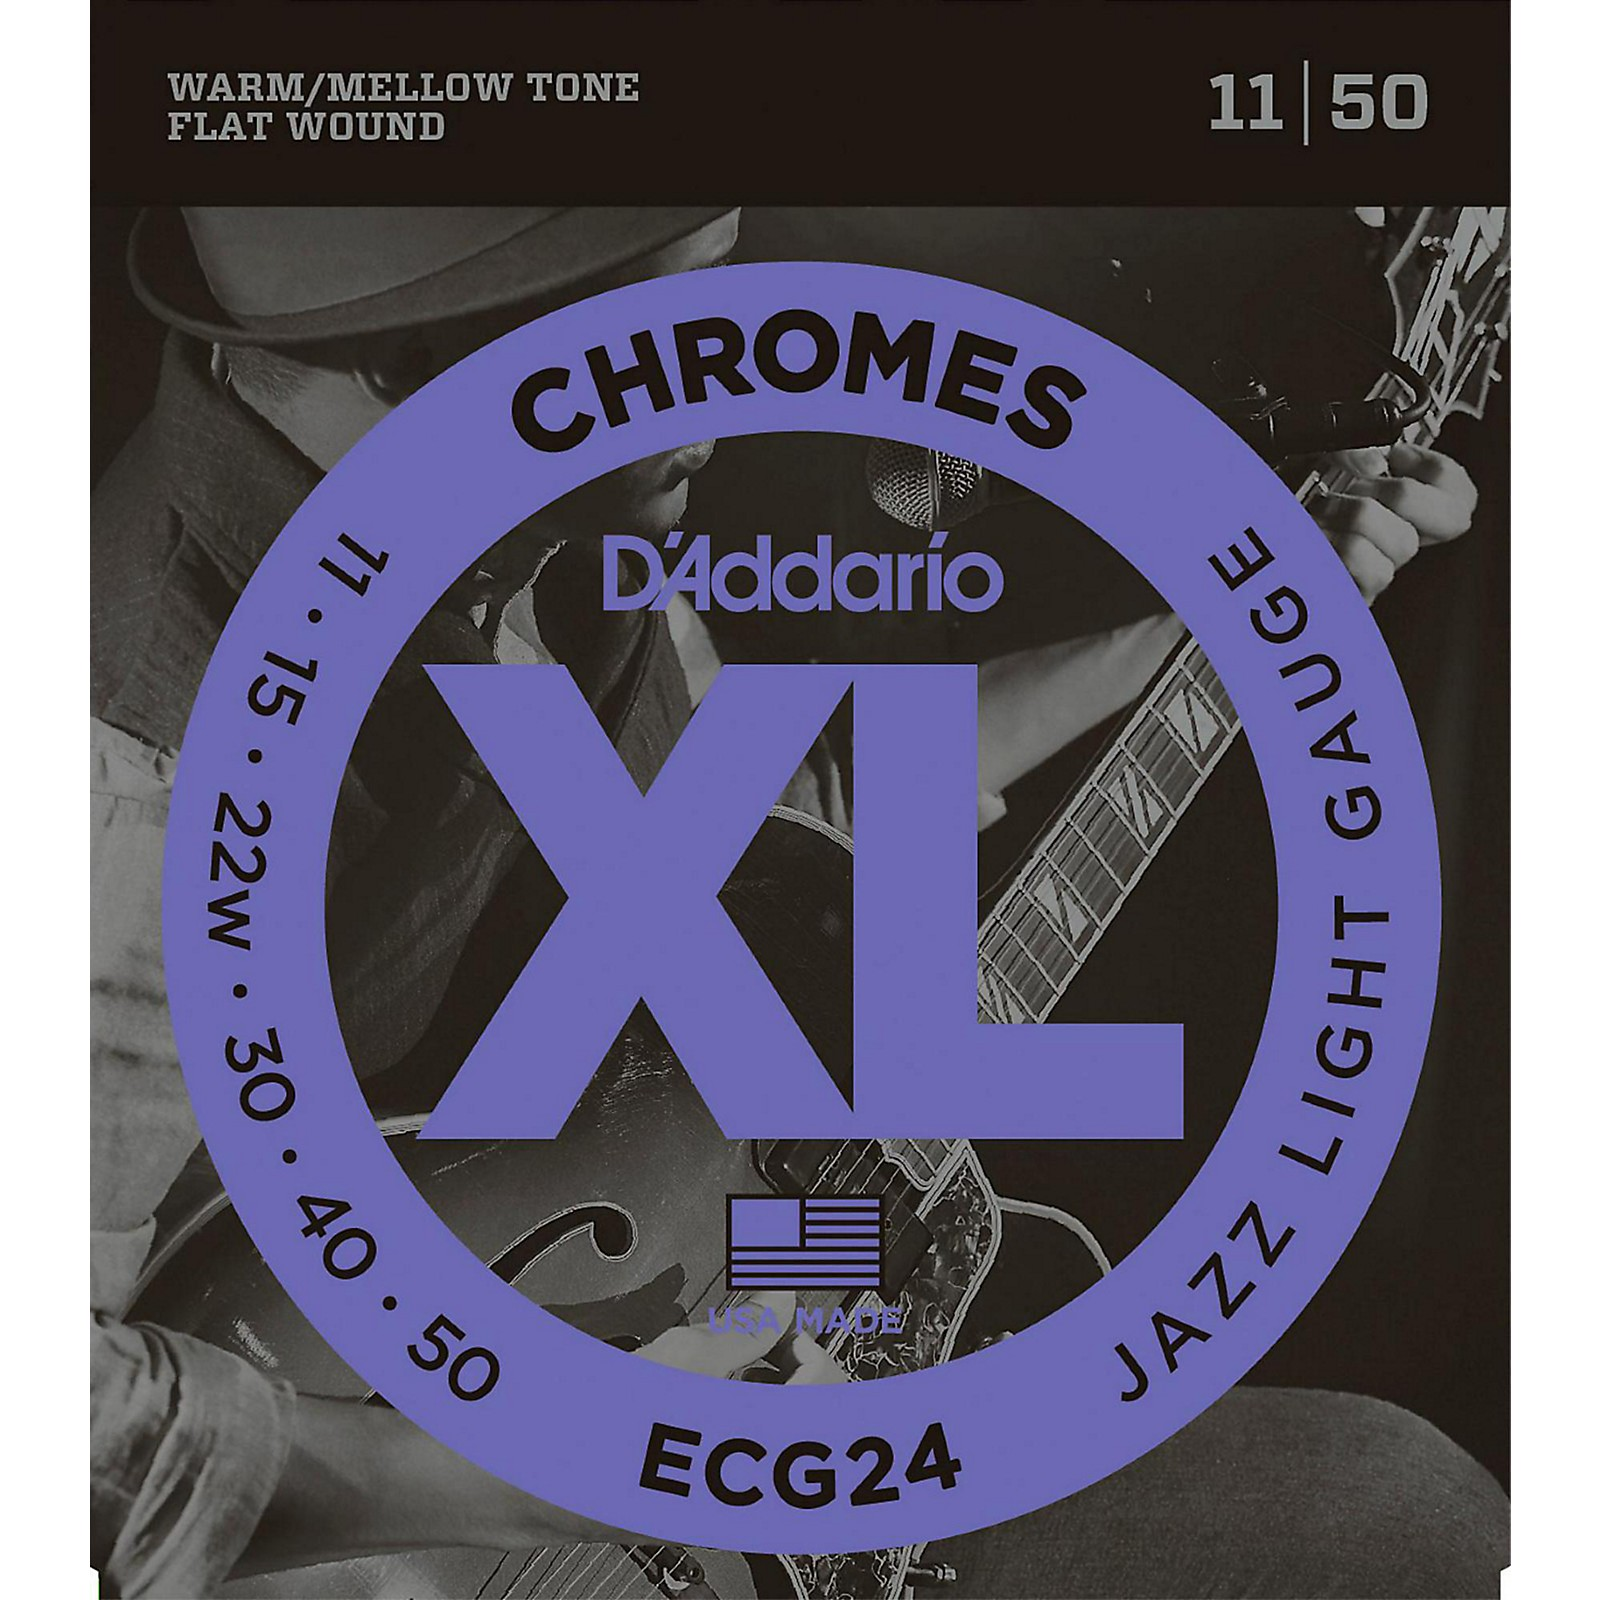 D'Addario XL Chromes Jazz Light Electric Guitar Strings ECG24 Flatwound